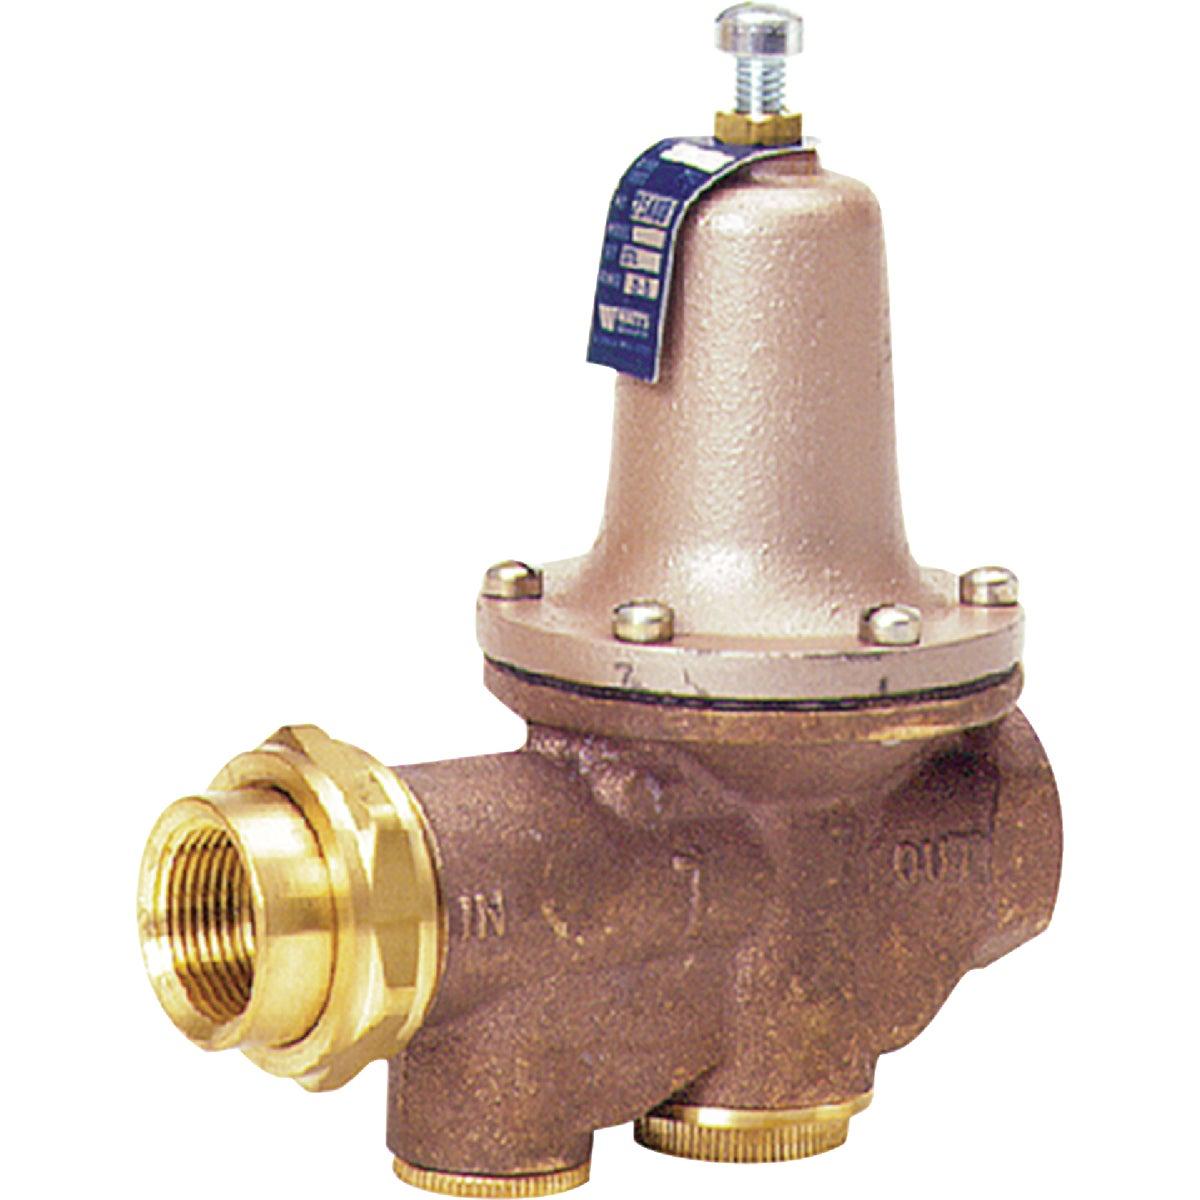 3/4 PRSR REDUCING VALVE - LF25AUBZ3 3/4 by Watts Regulator Co